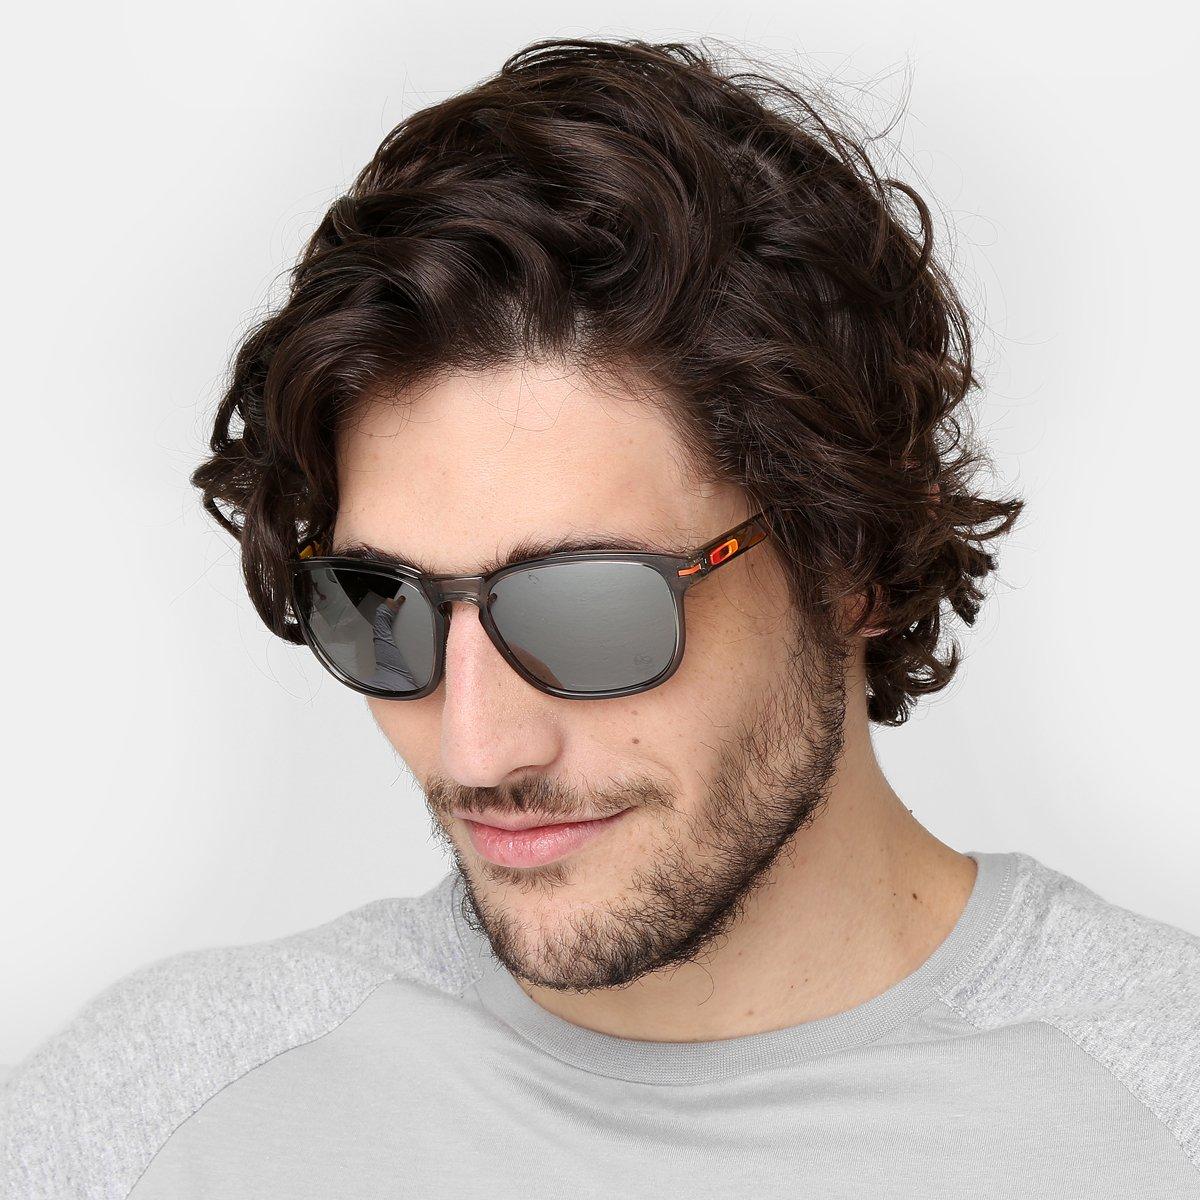 020687fb21a66 Óculos Oakley Enduro Masculino - Compre Agora   Netshoes